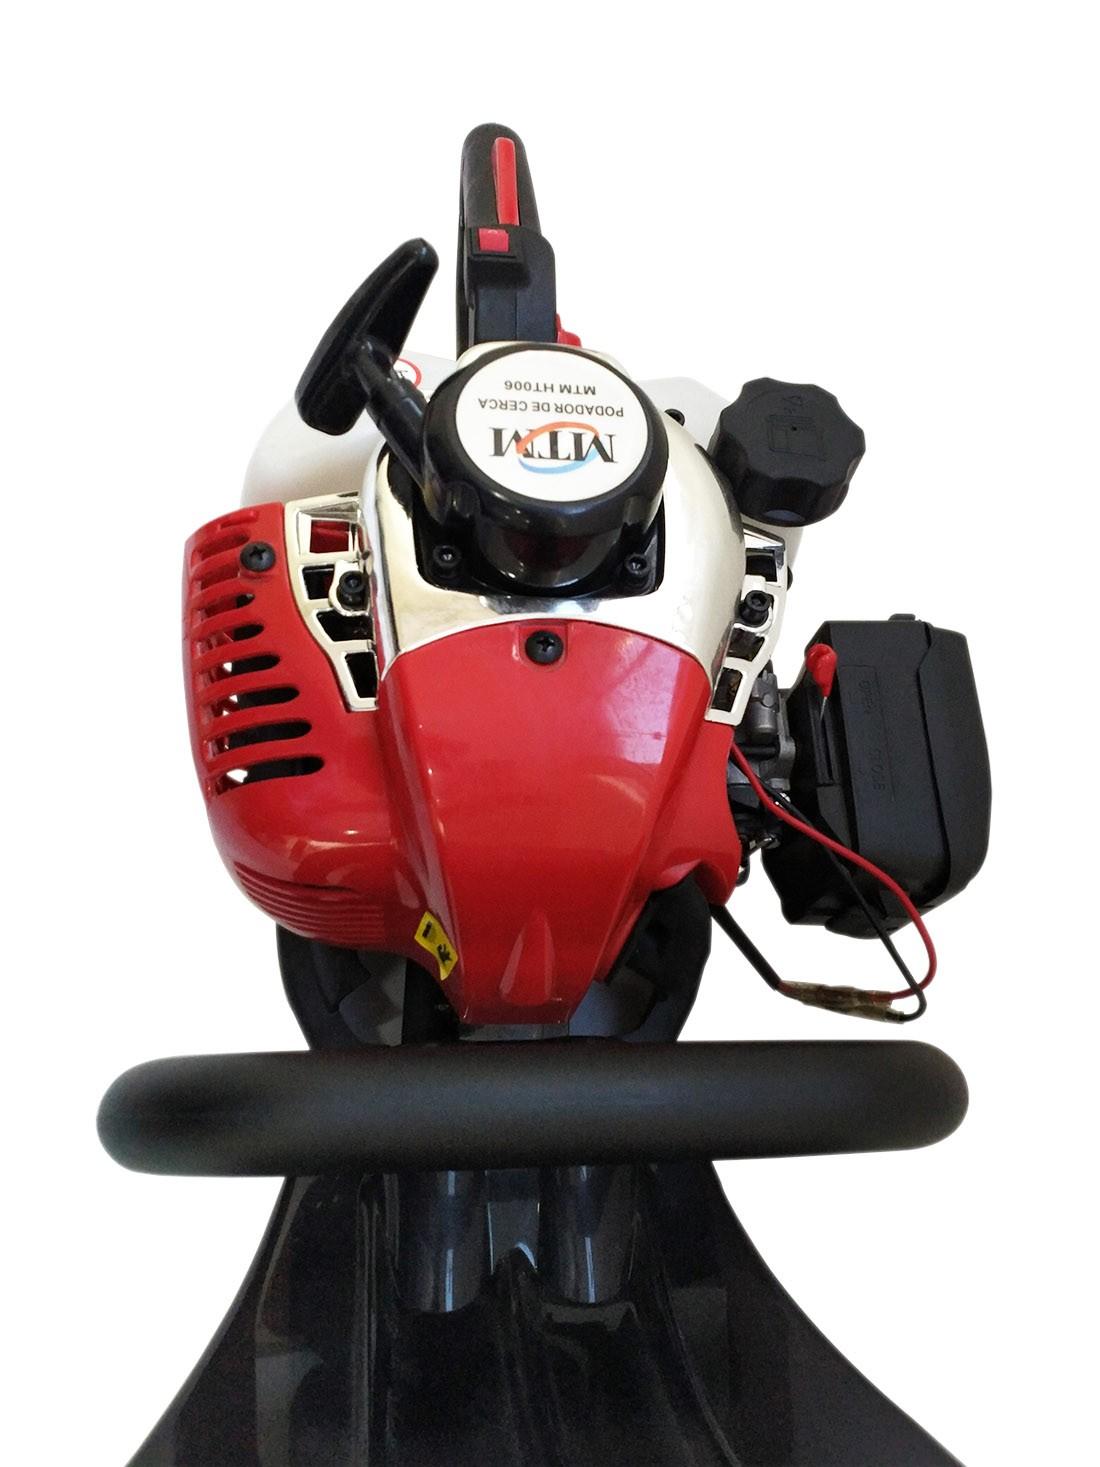 Cortador Podador (Cerca Viva) a Gasolina 2T - 0,8KW - 22,5CC - 2600RPM